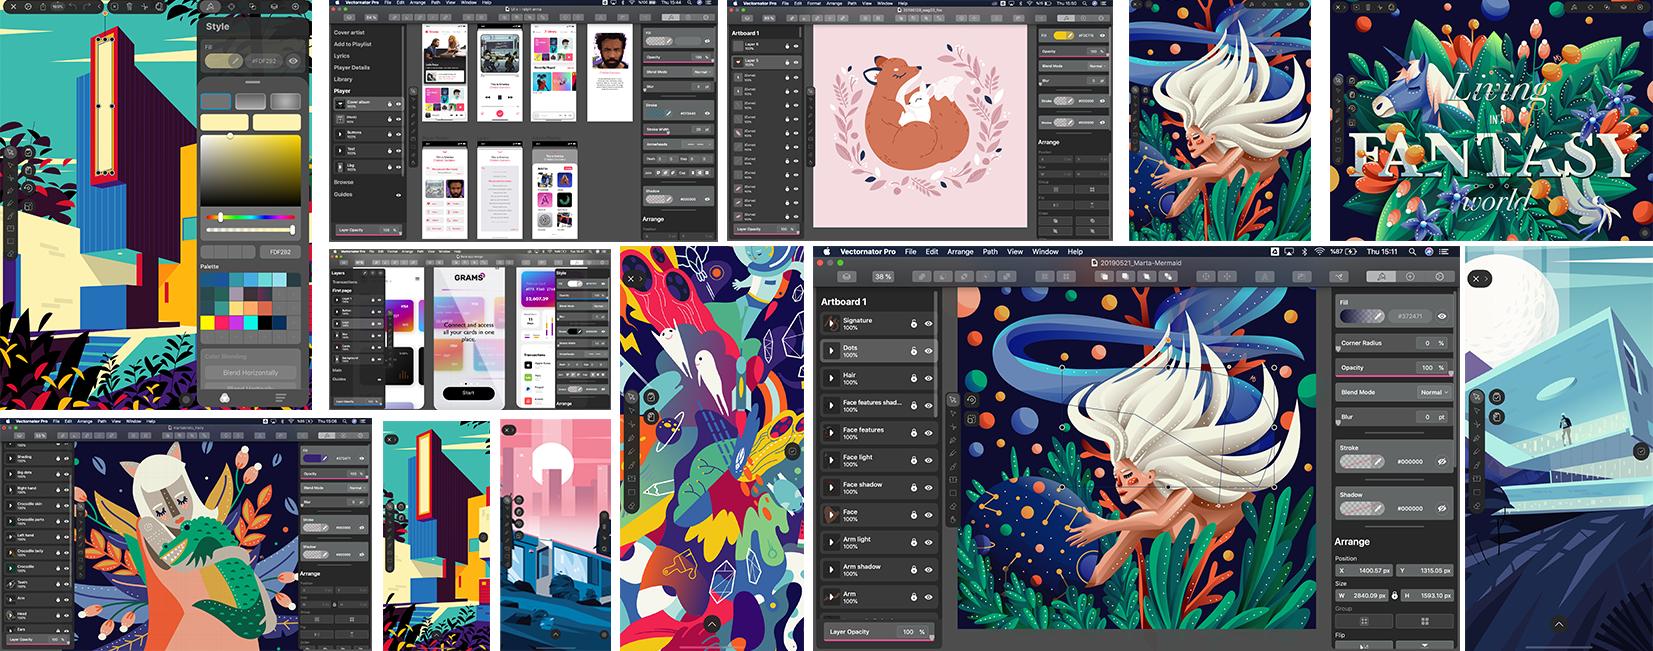 ipad graphic design gallery